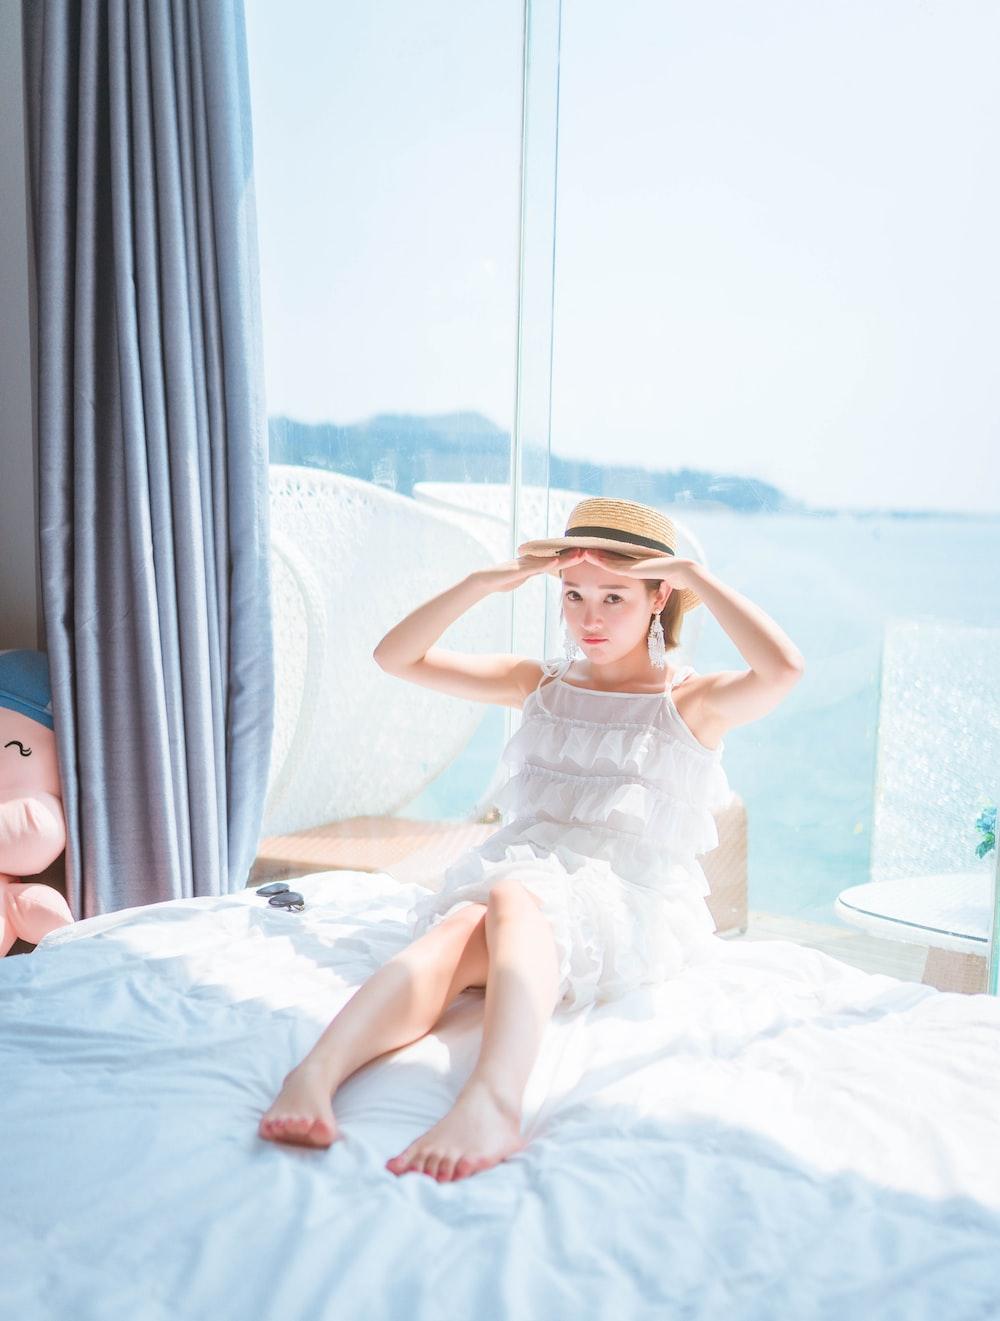 woman wearing white sleeveless dress on bed